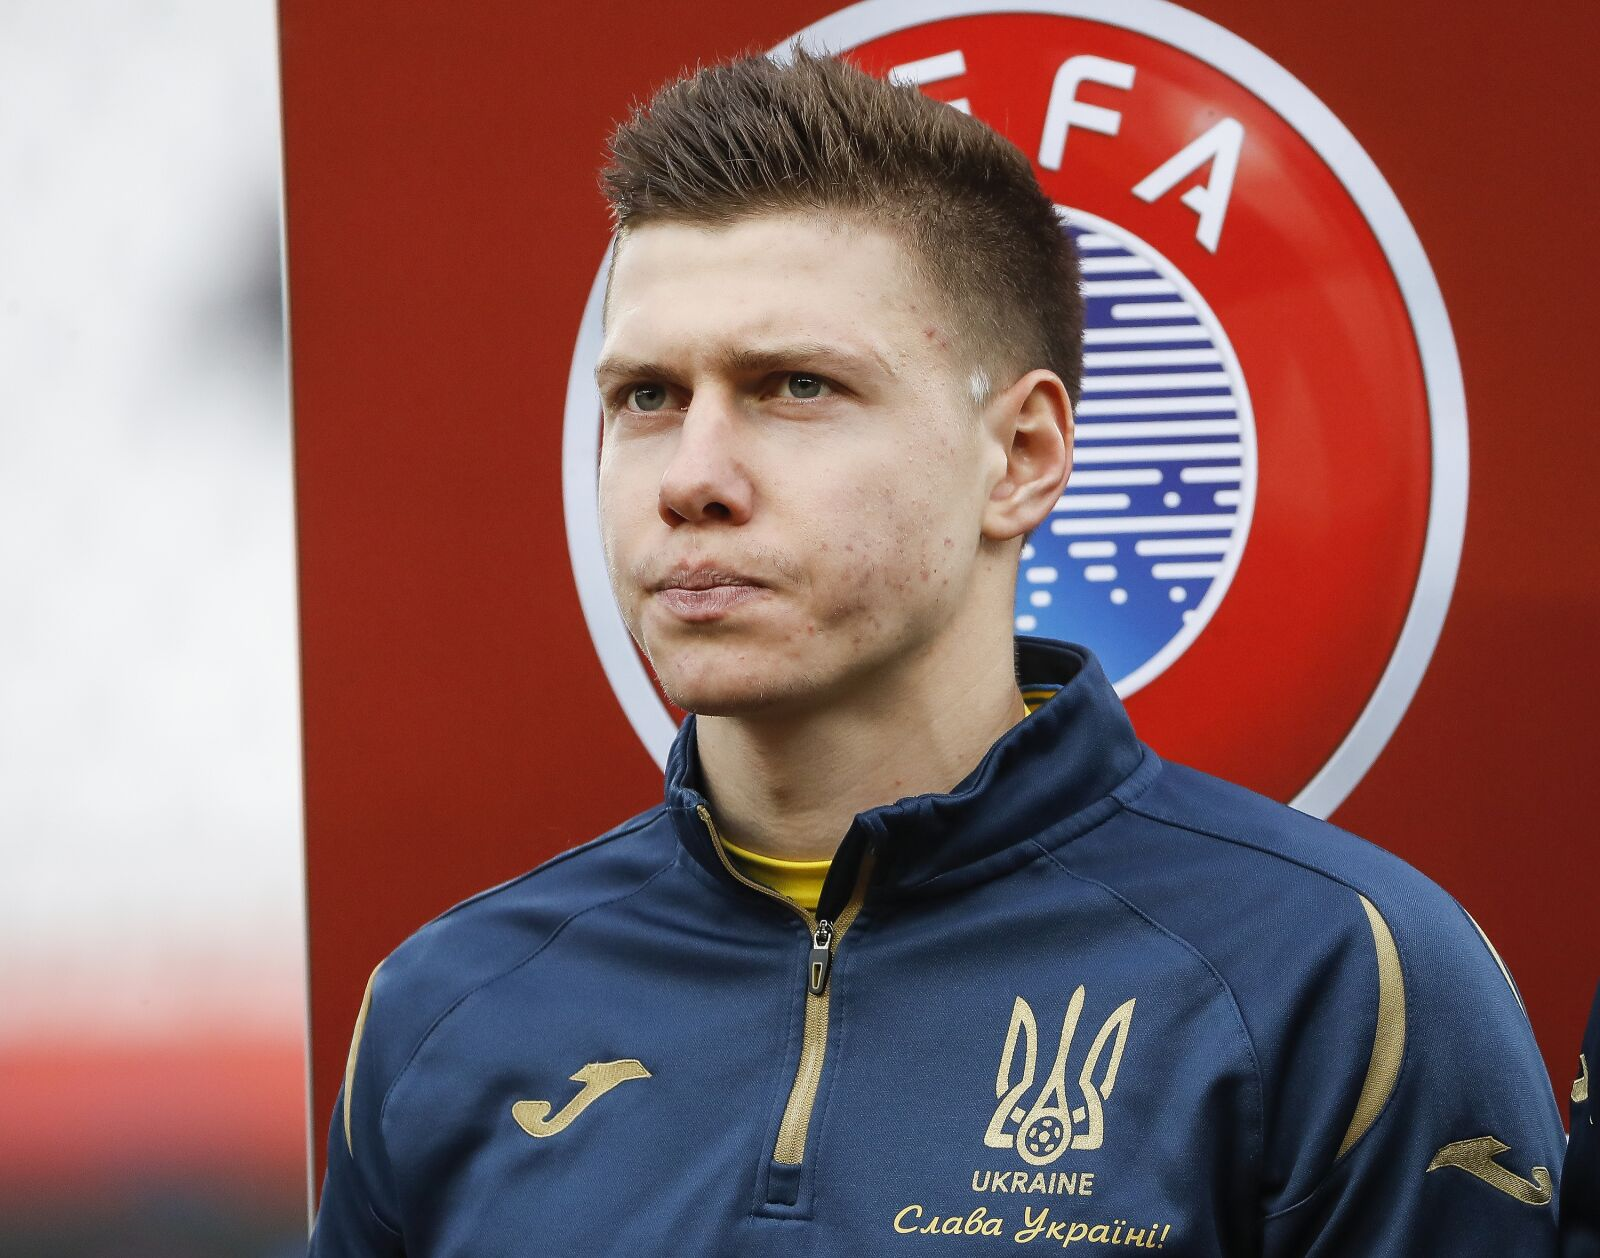 Arsenal: Mykola Matviyenko a very different type of transfer